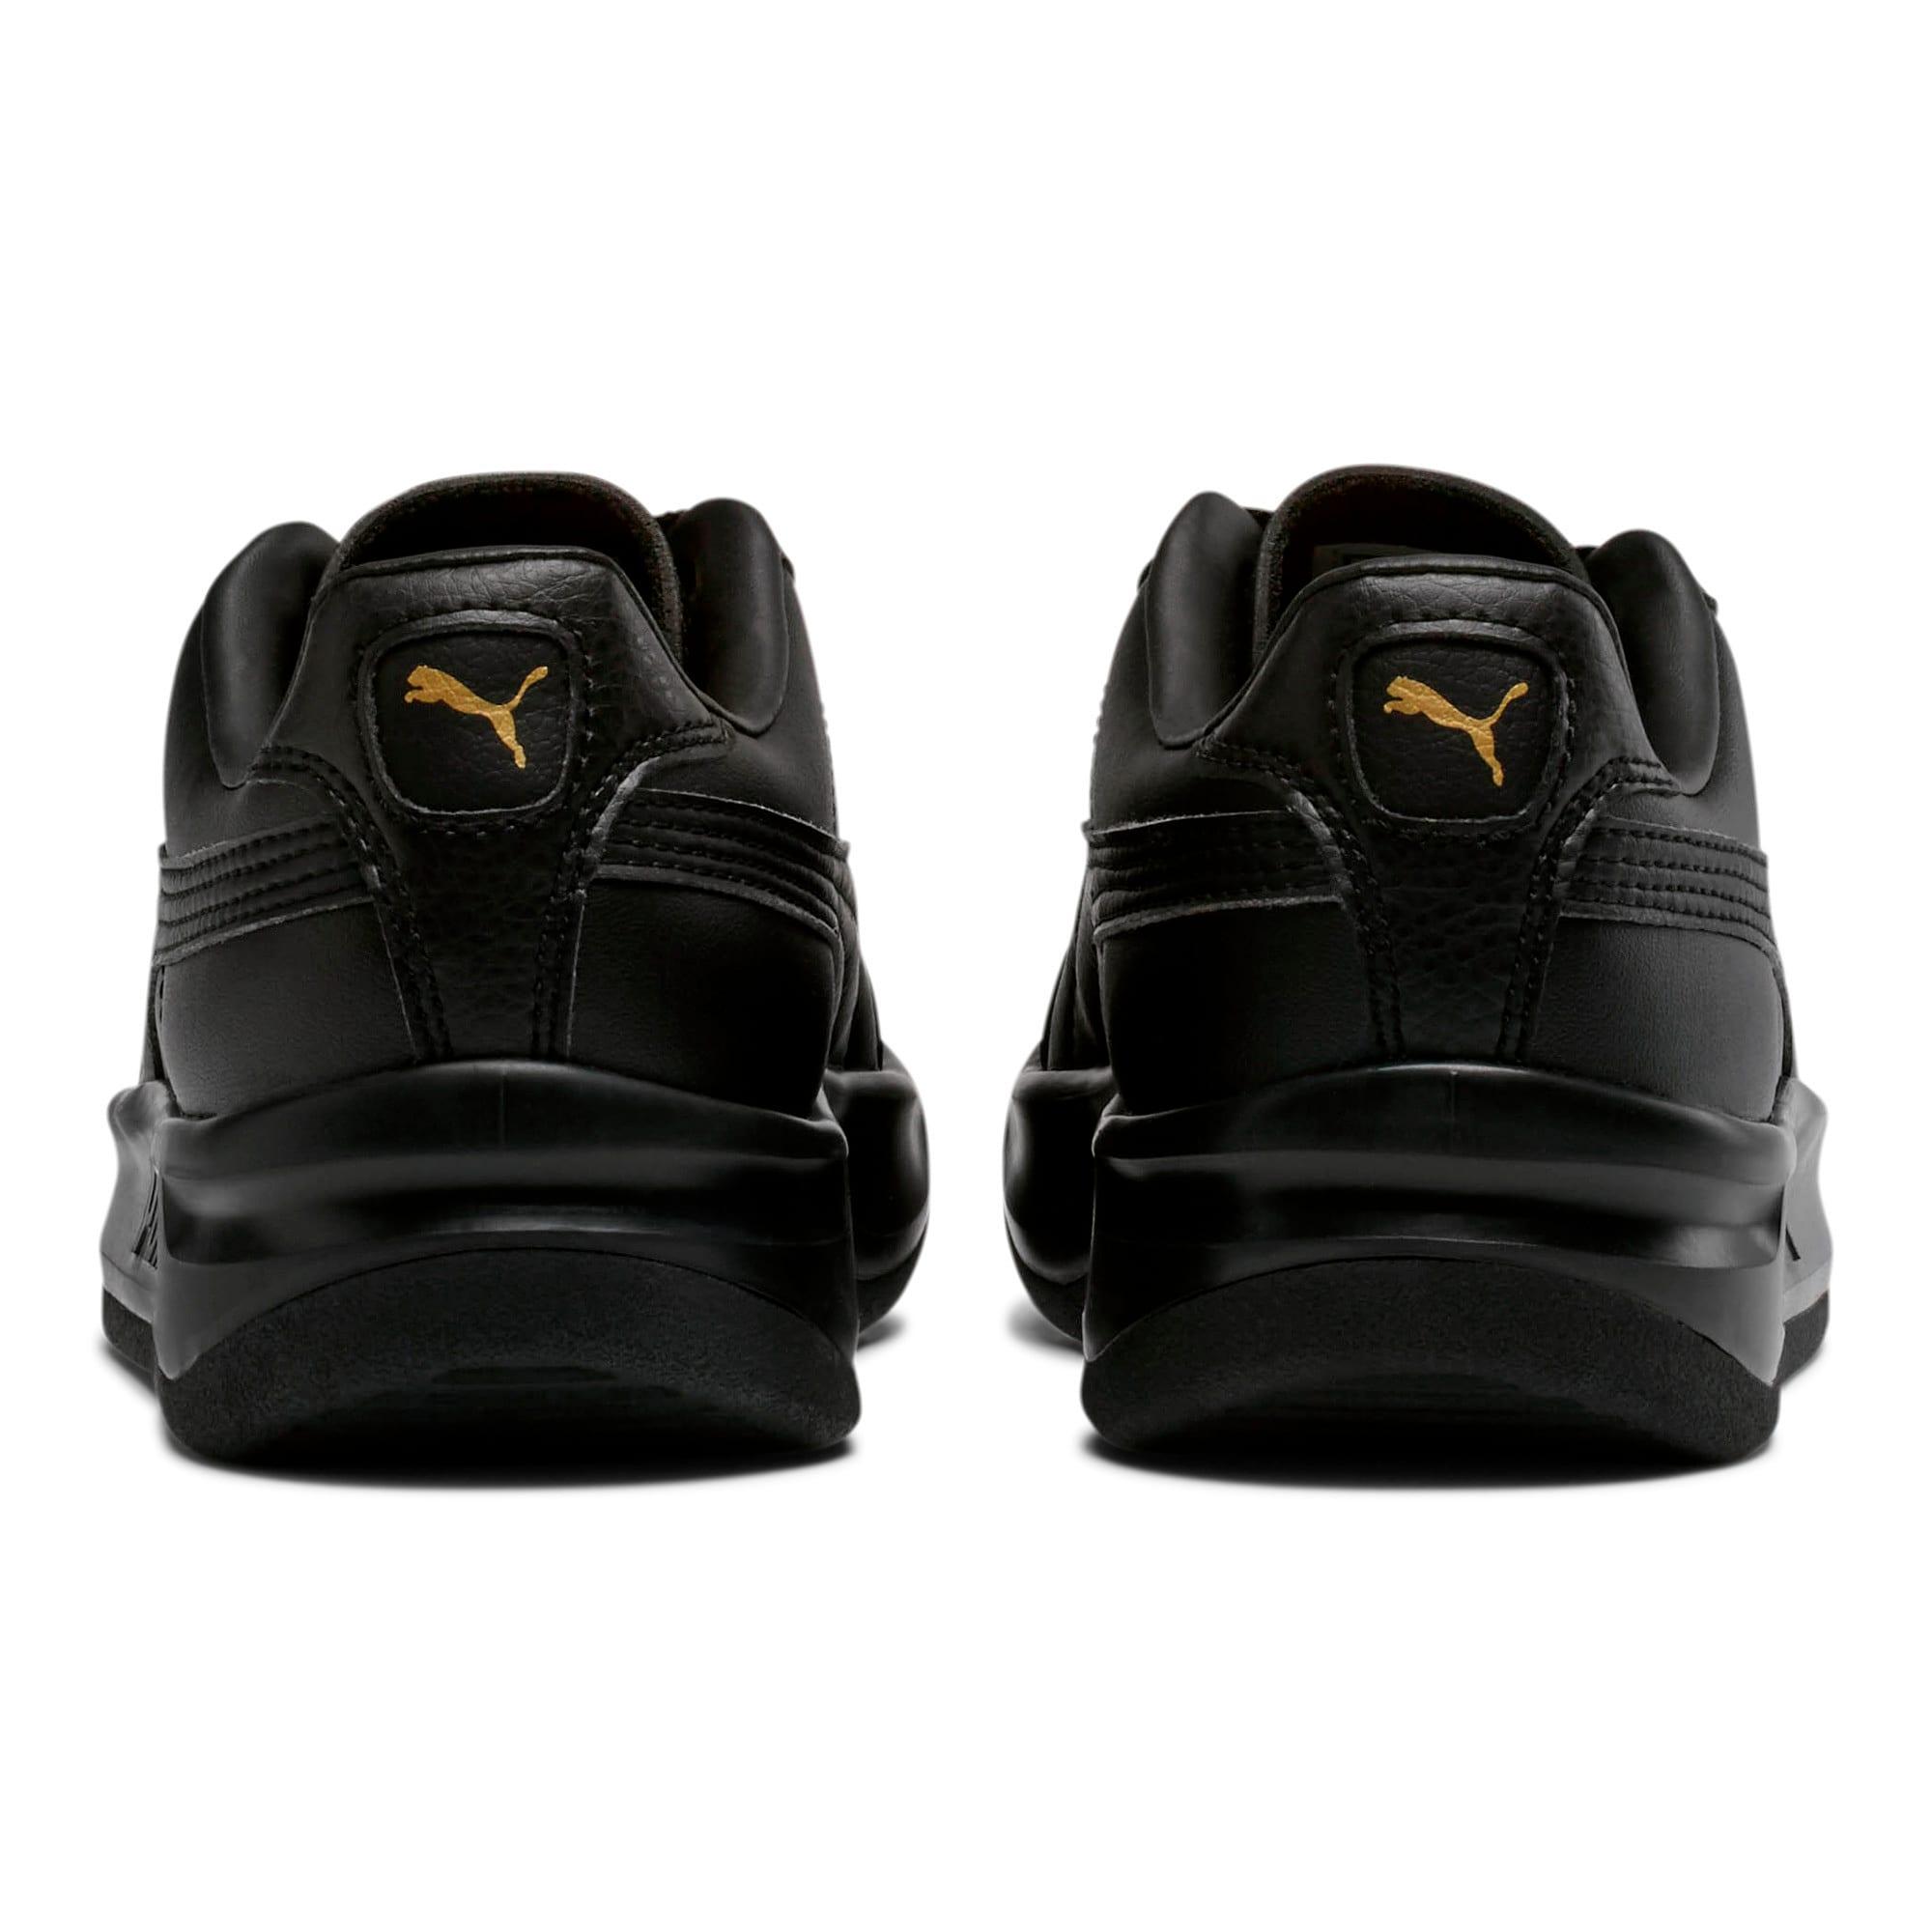 Thumbnail 4 of GV Special Sneakers JR, Puma Black-Puma Team Gold, medium